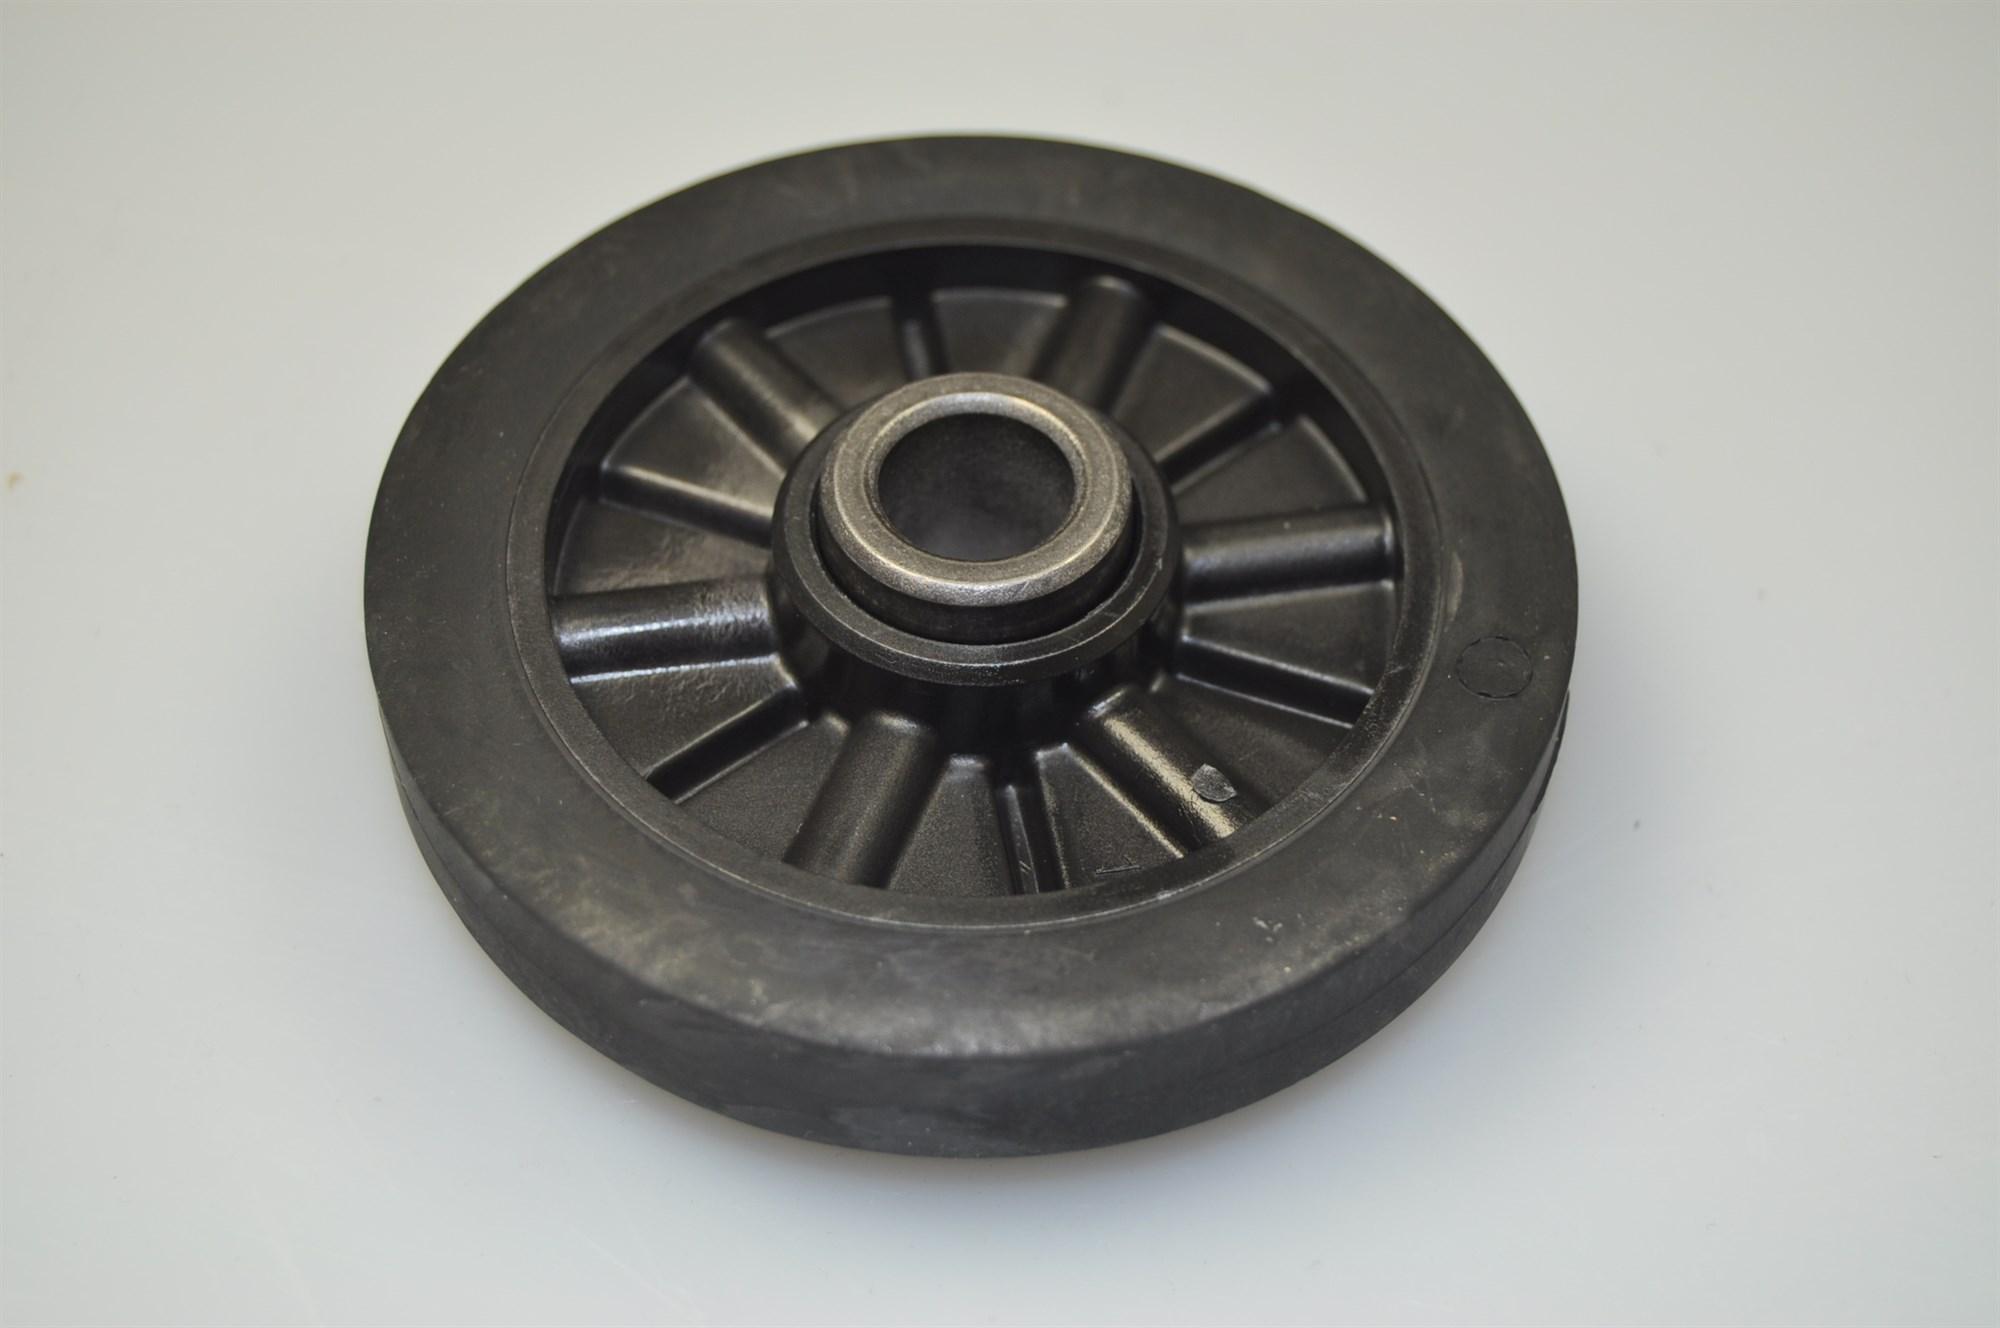 Drum Wheel Whirlpool Tumble Dryer Rear